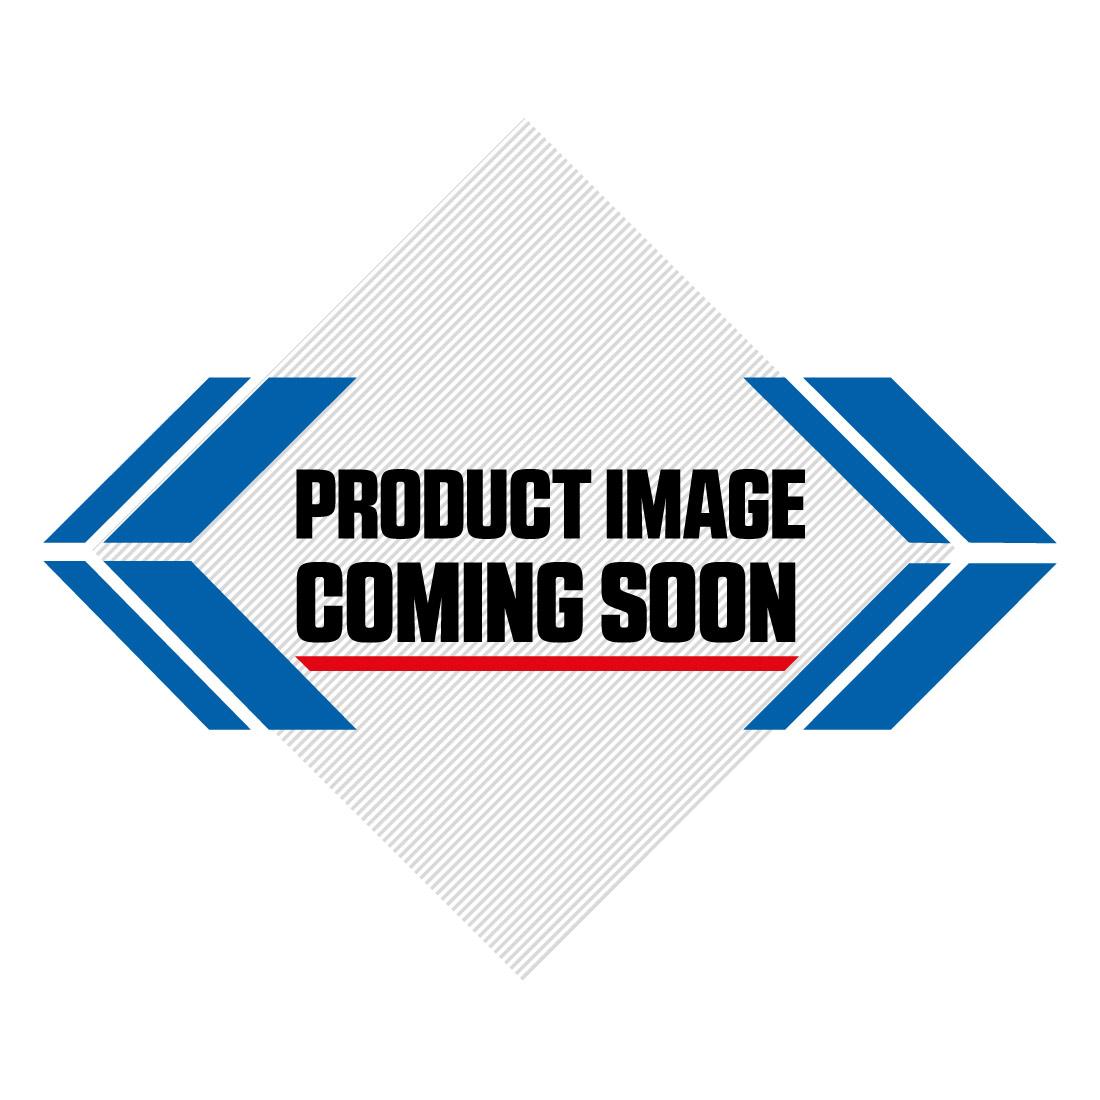 Kawasaki Restyled Plastic Kit KX 85 (2010) OEM Factory Image-3